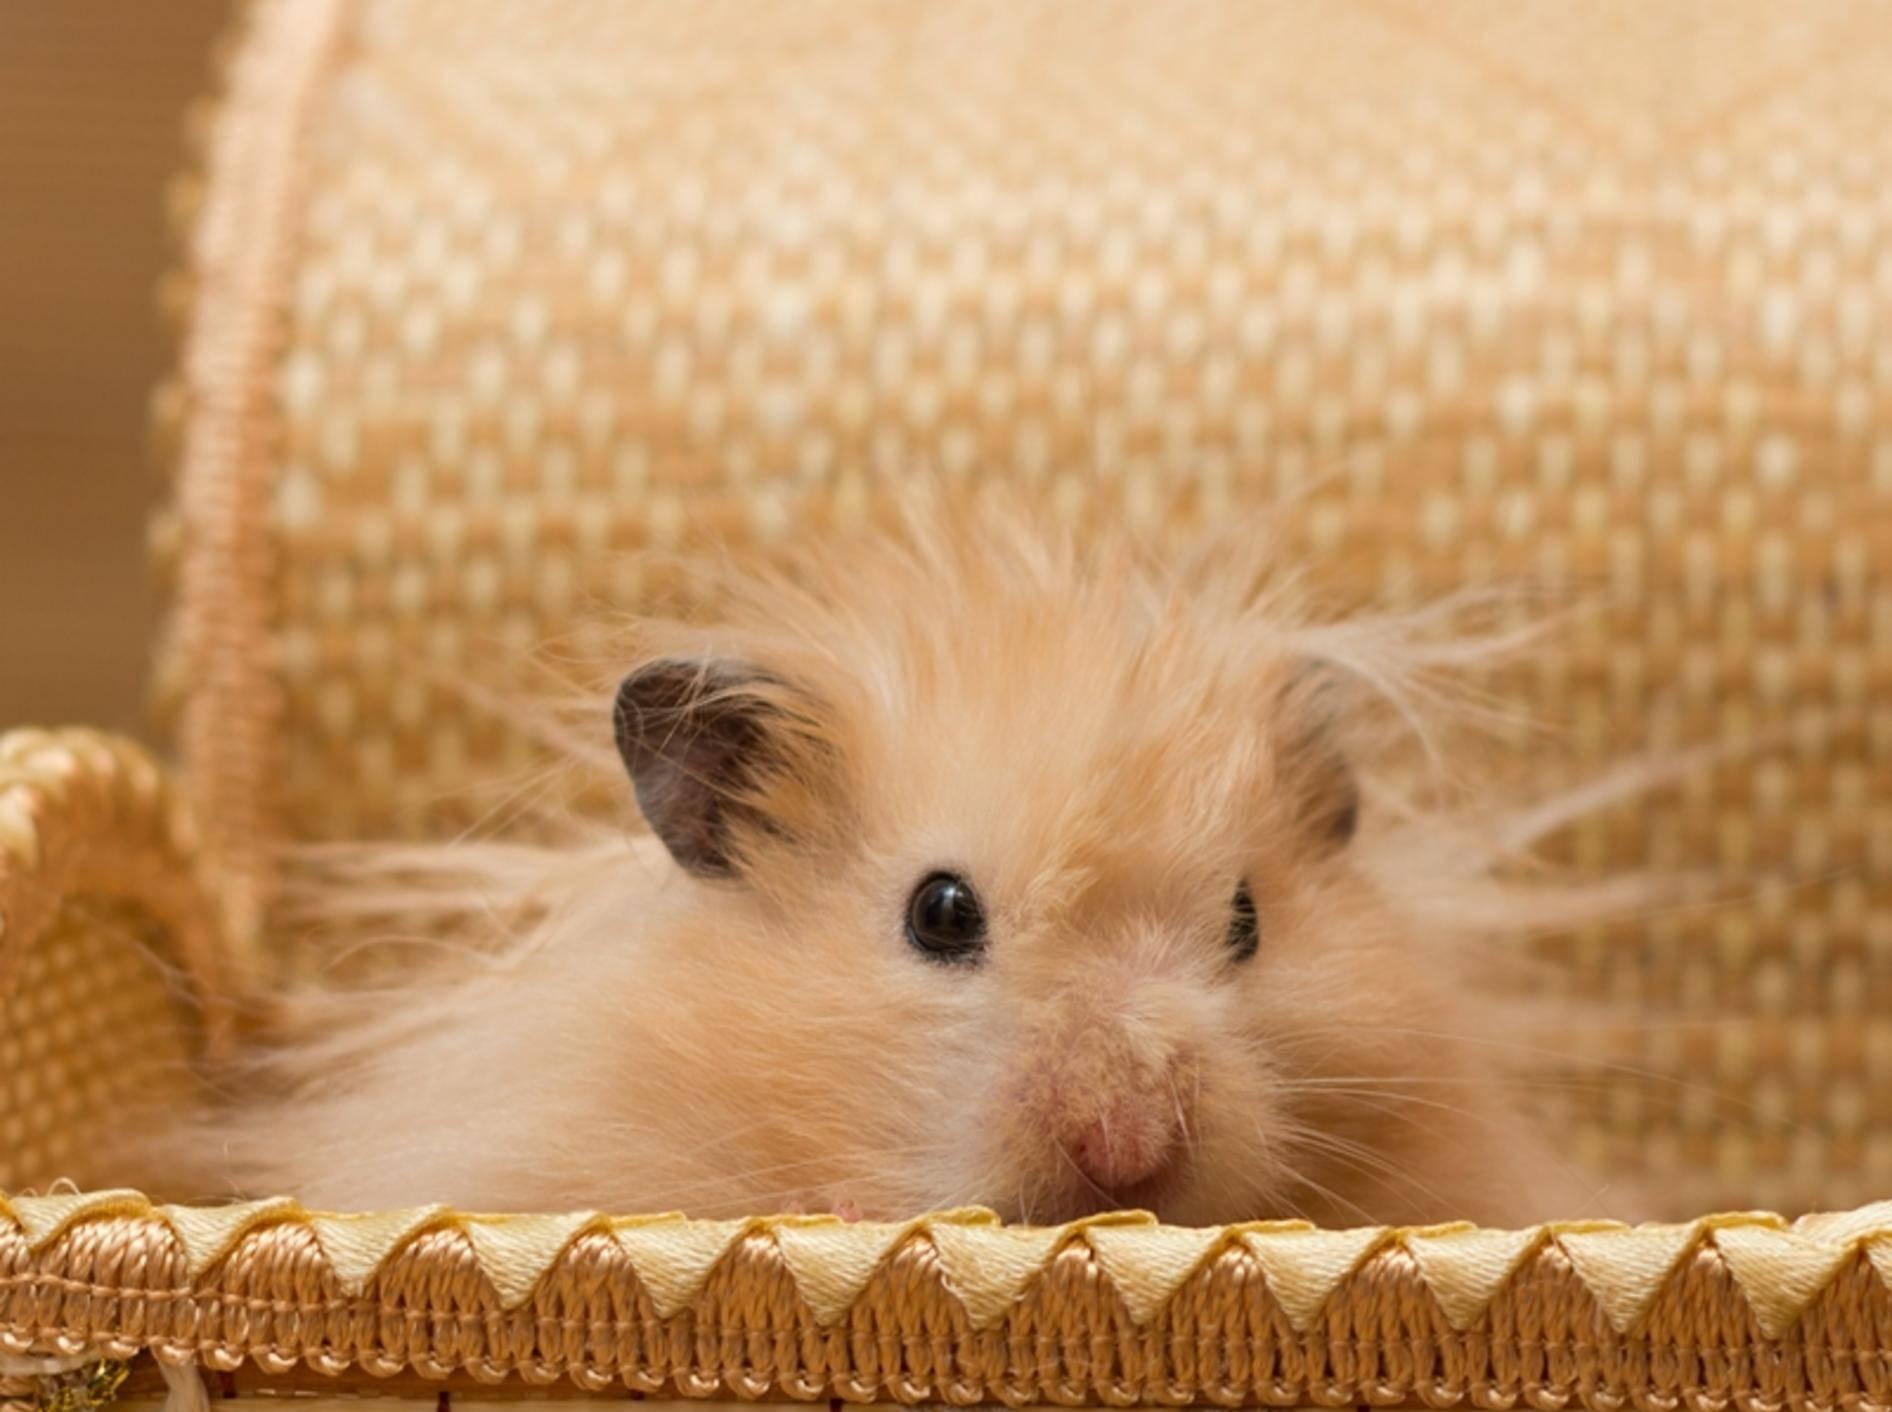 Da muss wohl jemand mal wieder zum Hamster-Friseur — Bild: Shutterstock / Tikhonova Yana